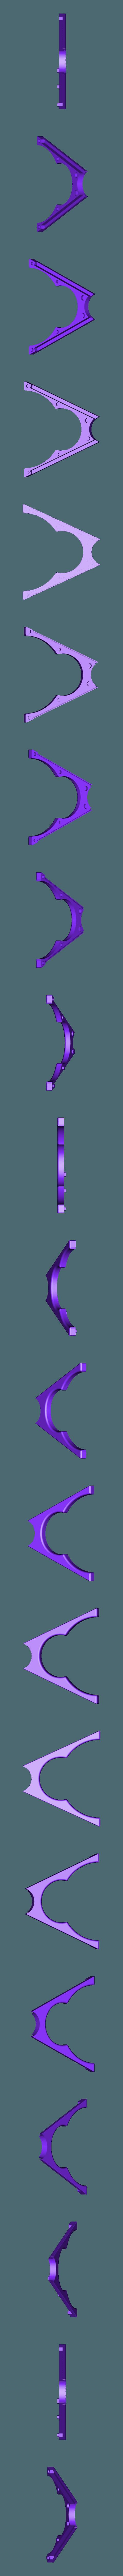 Switcherang: Nintendo Switch Joy-Con Grip